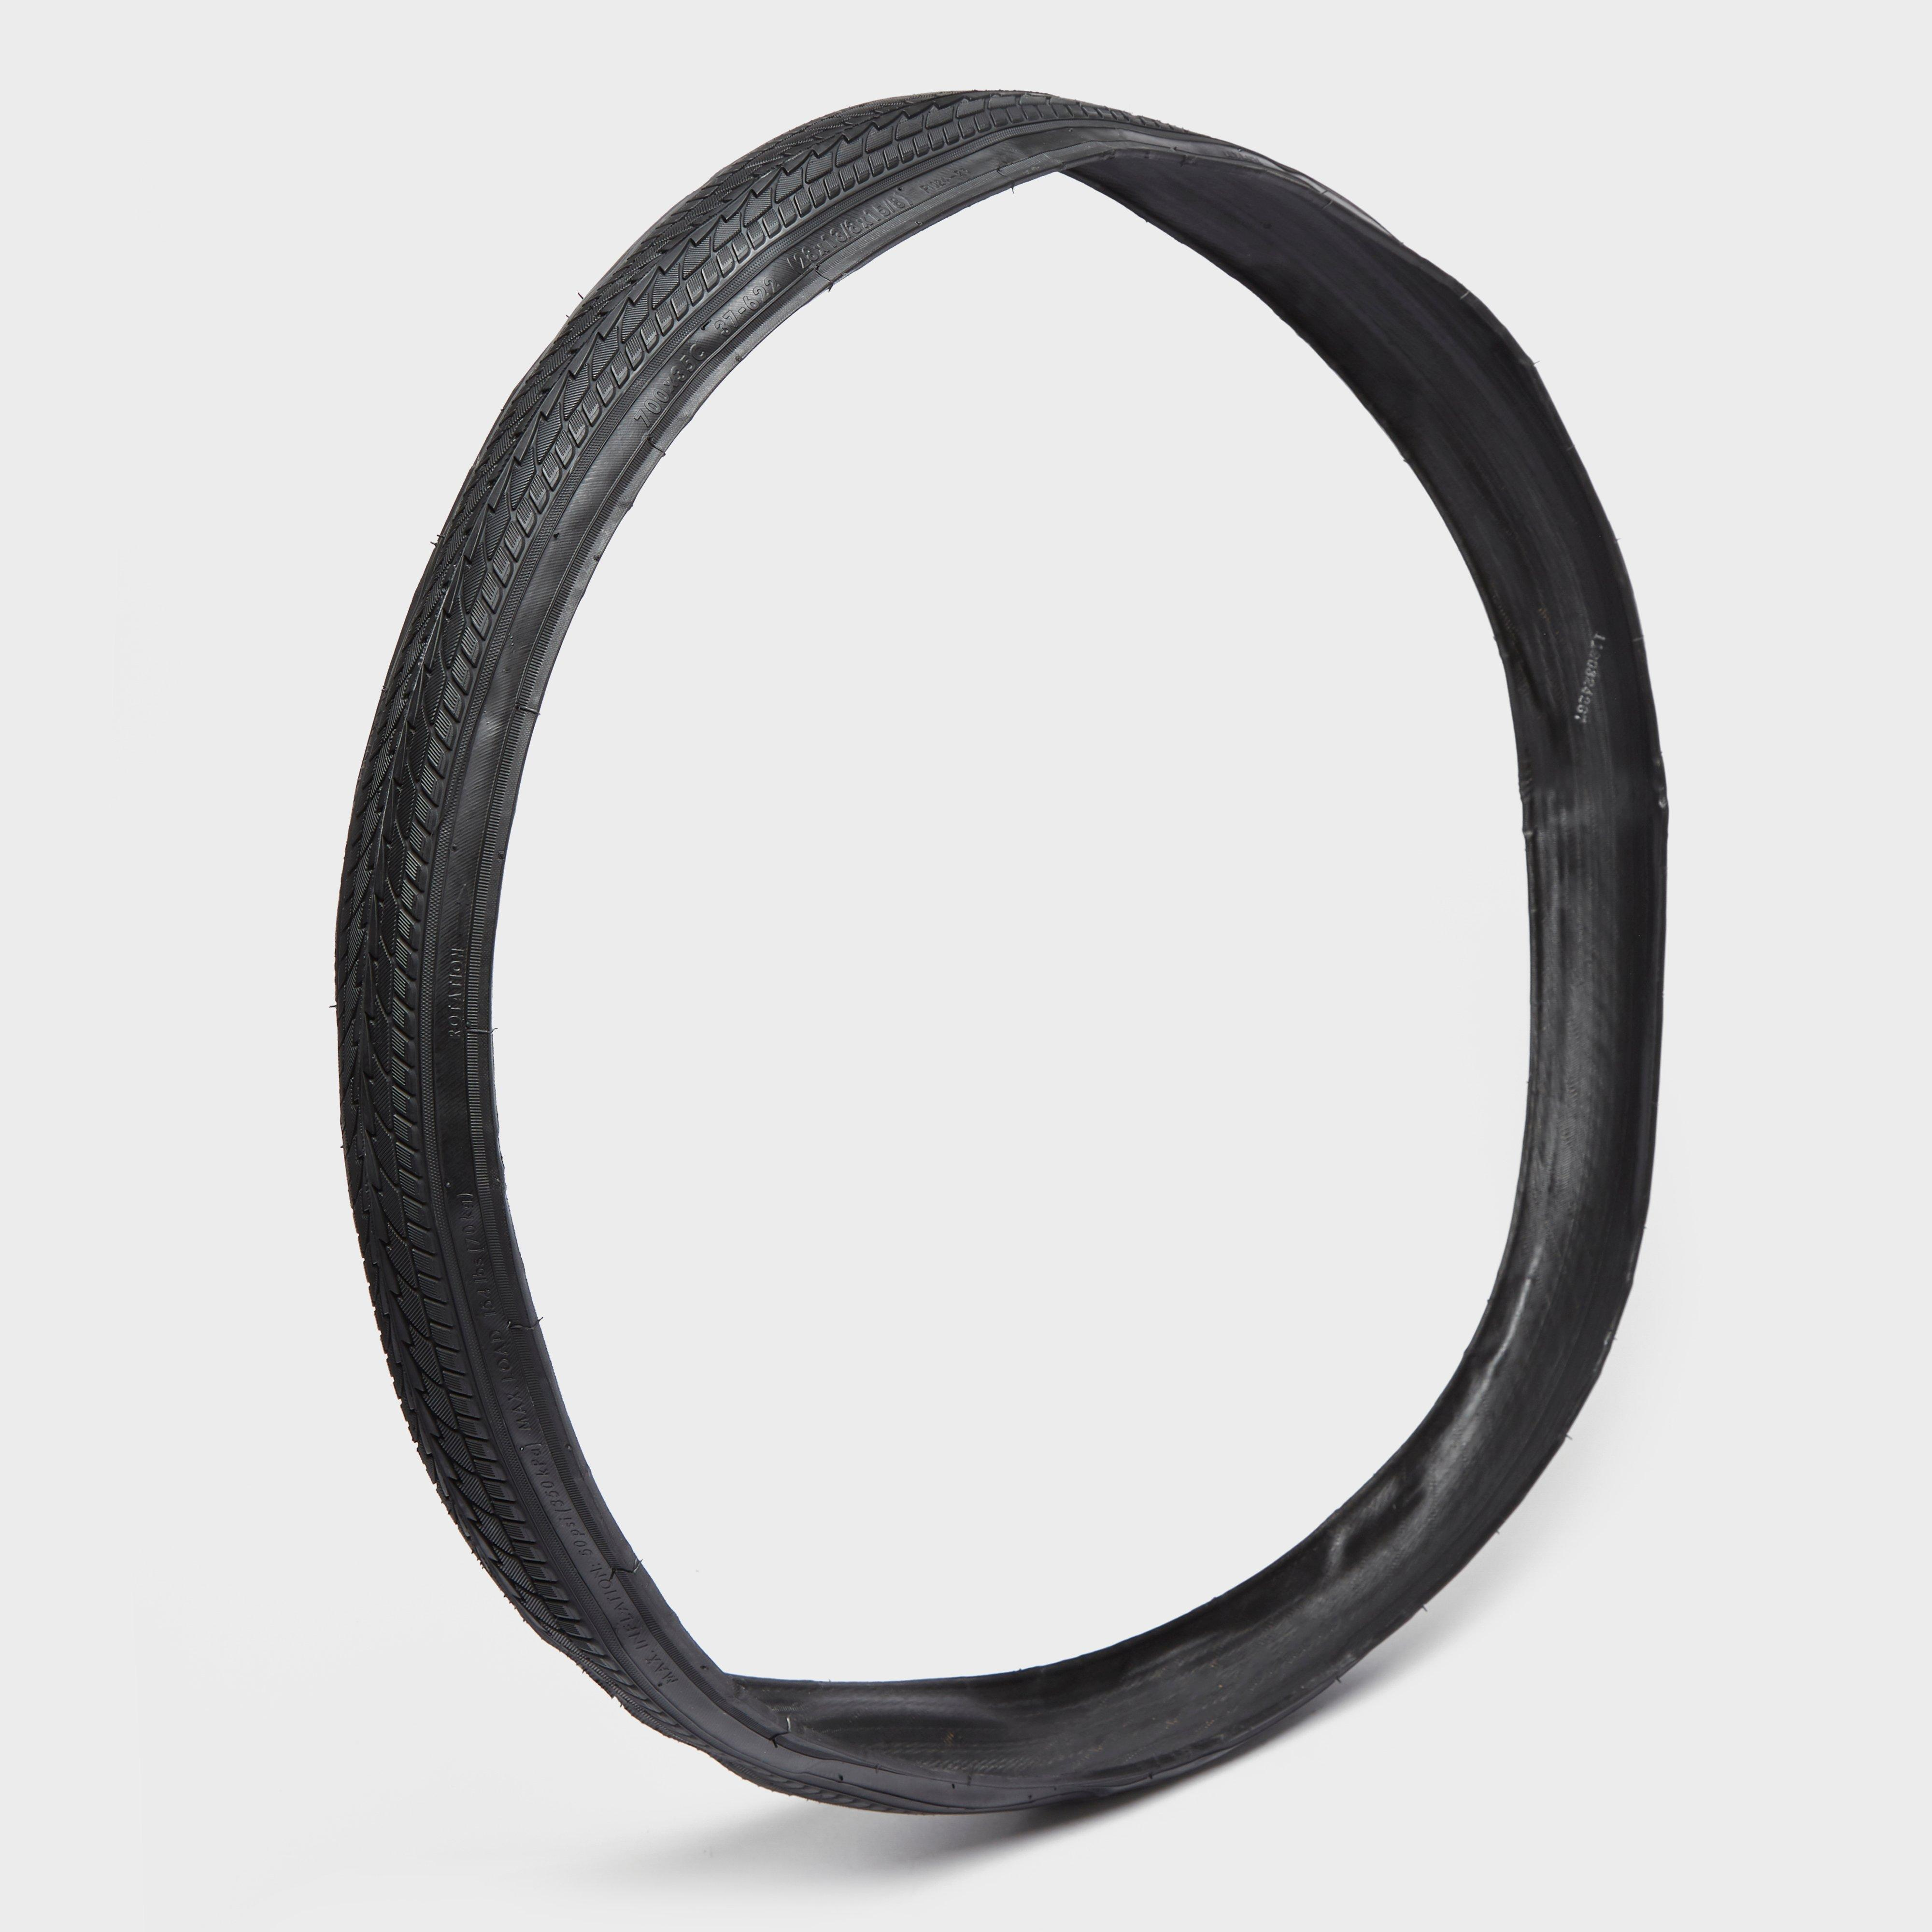 One23 700 X 35 Folding City Bike Tyre - Black/city  Black/city